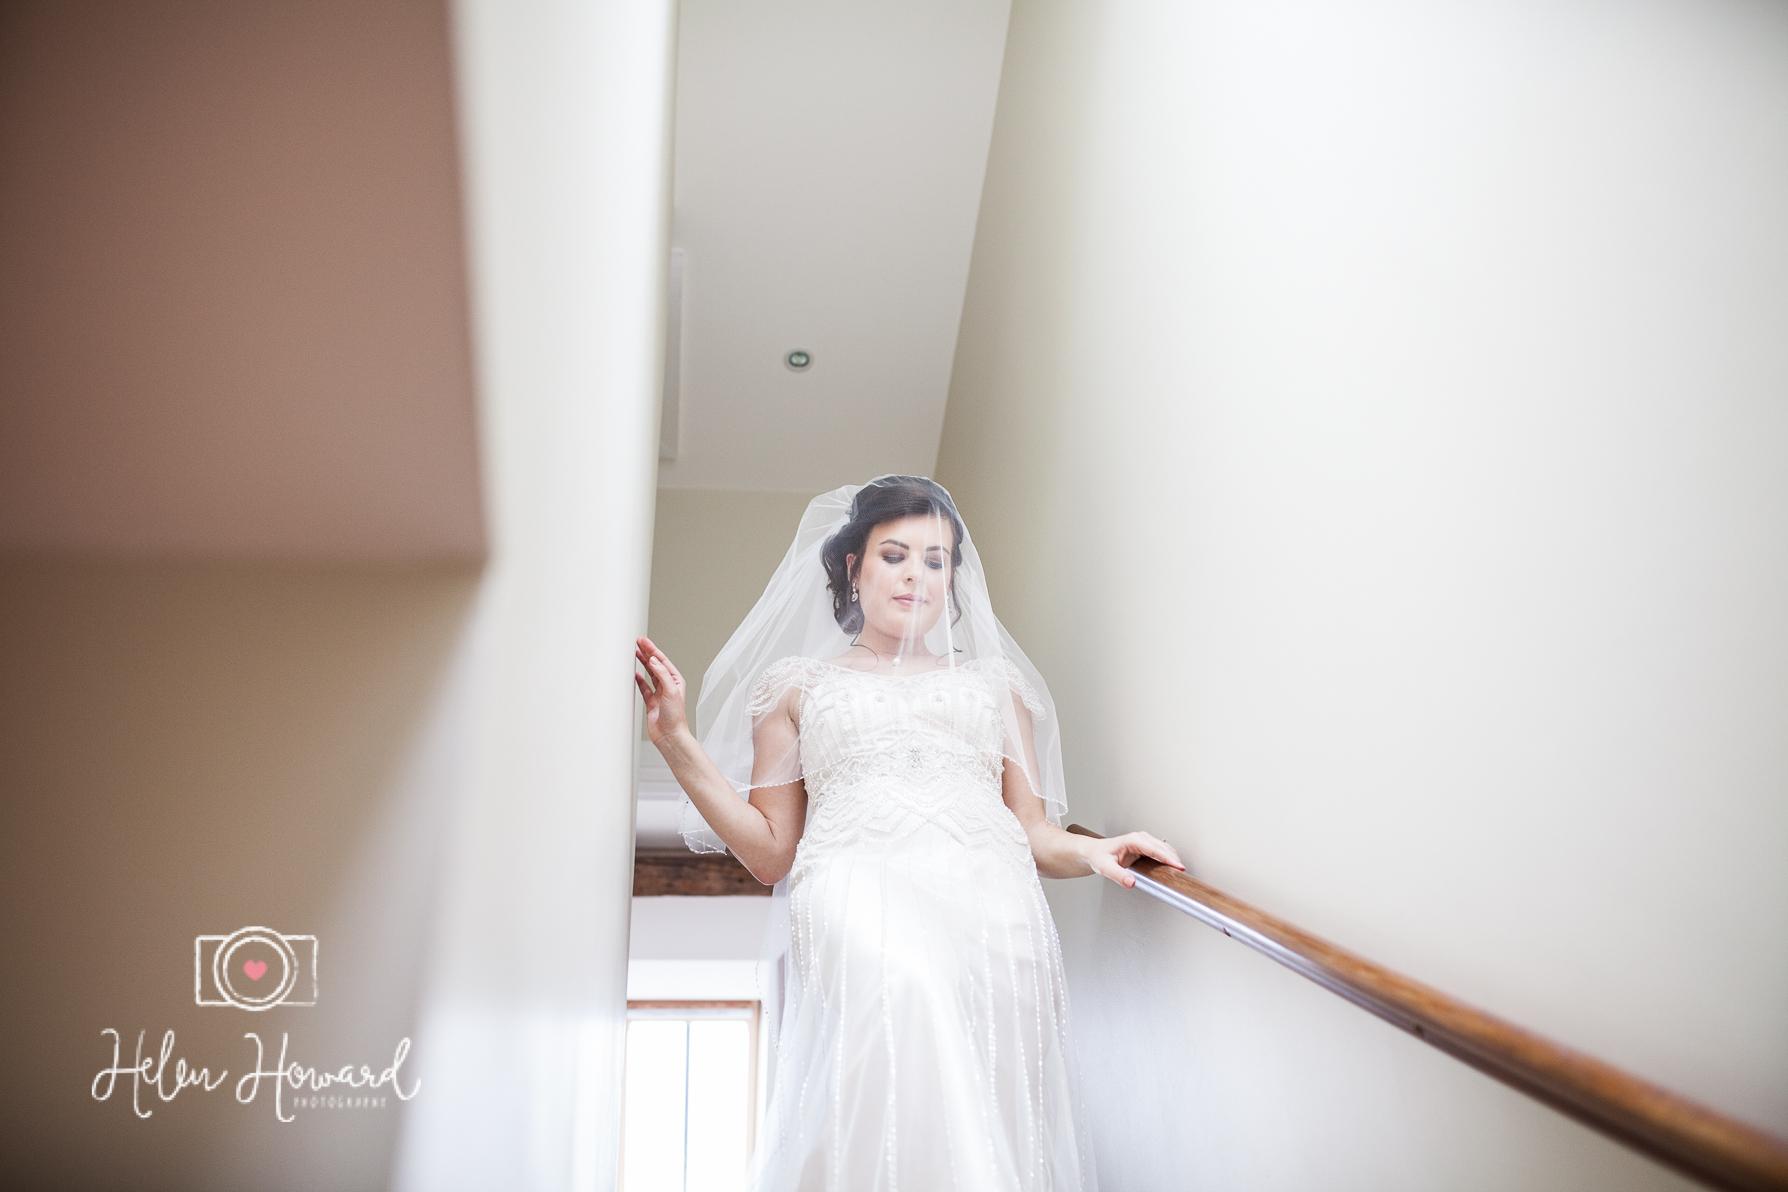 Helen Howard Photography Packington Moor Wedding-49.jpg